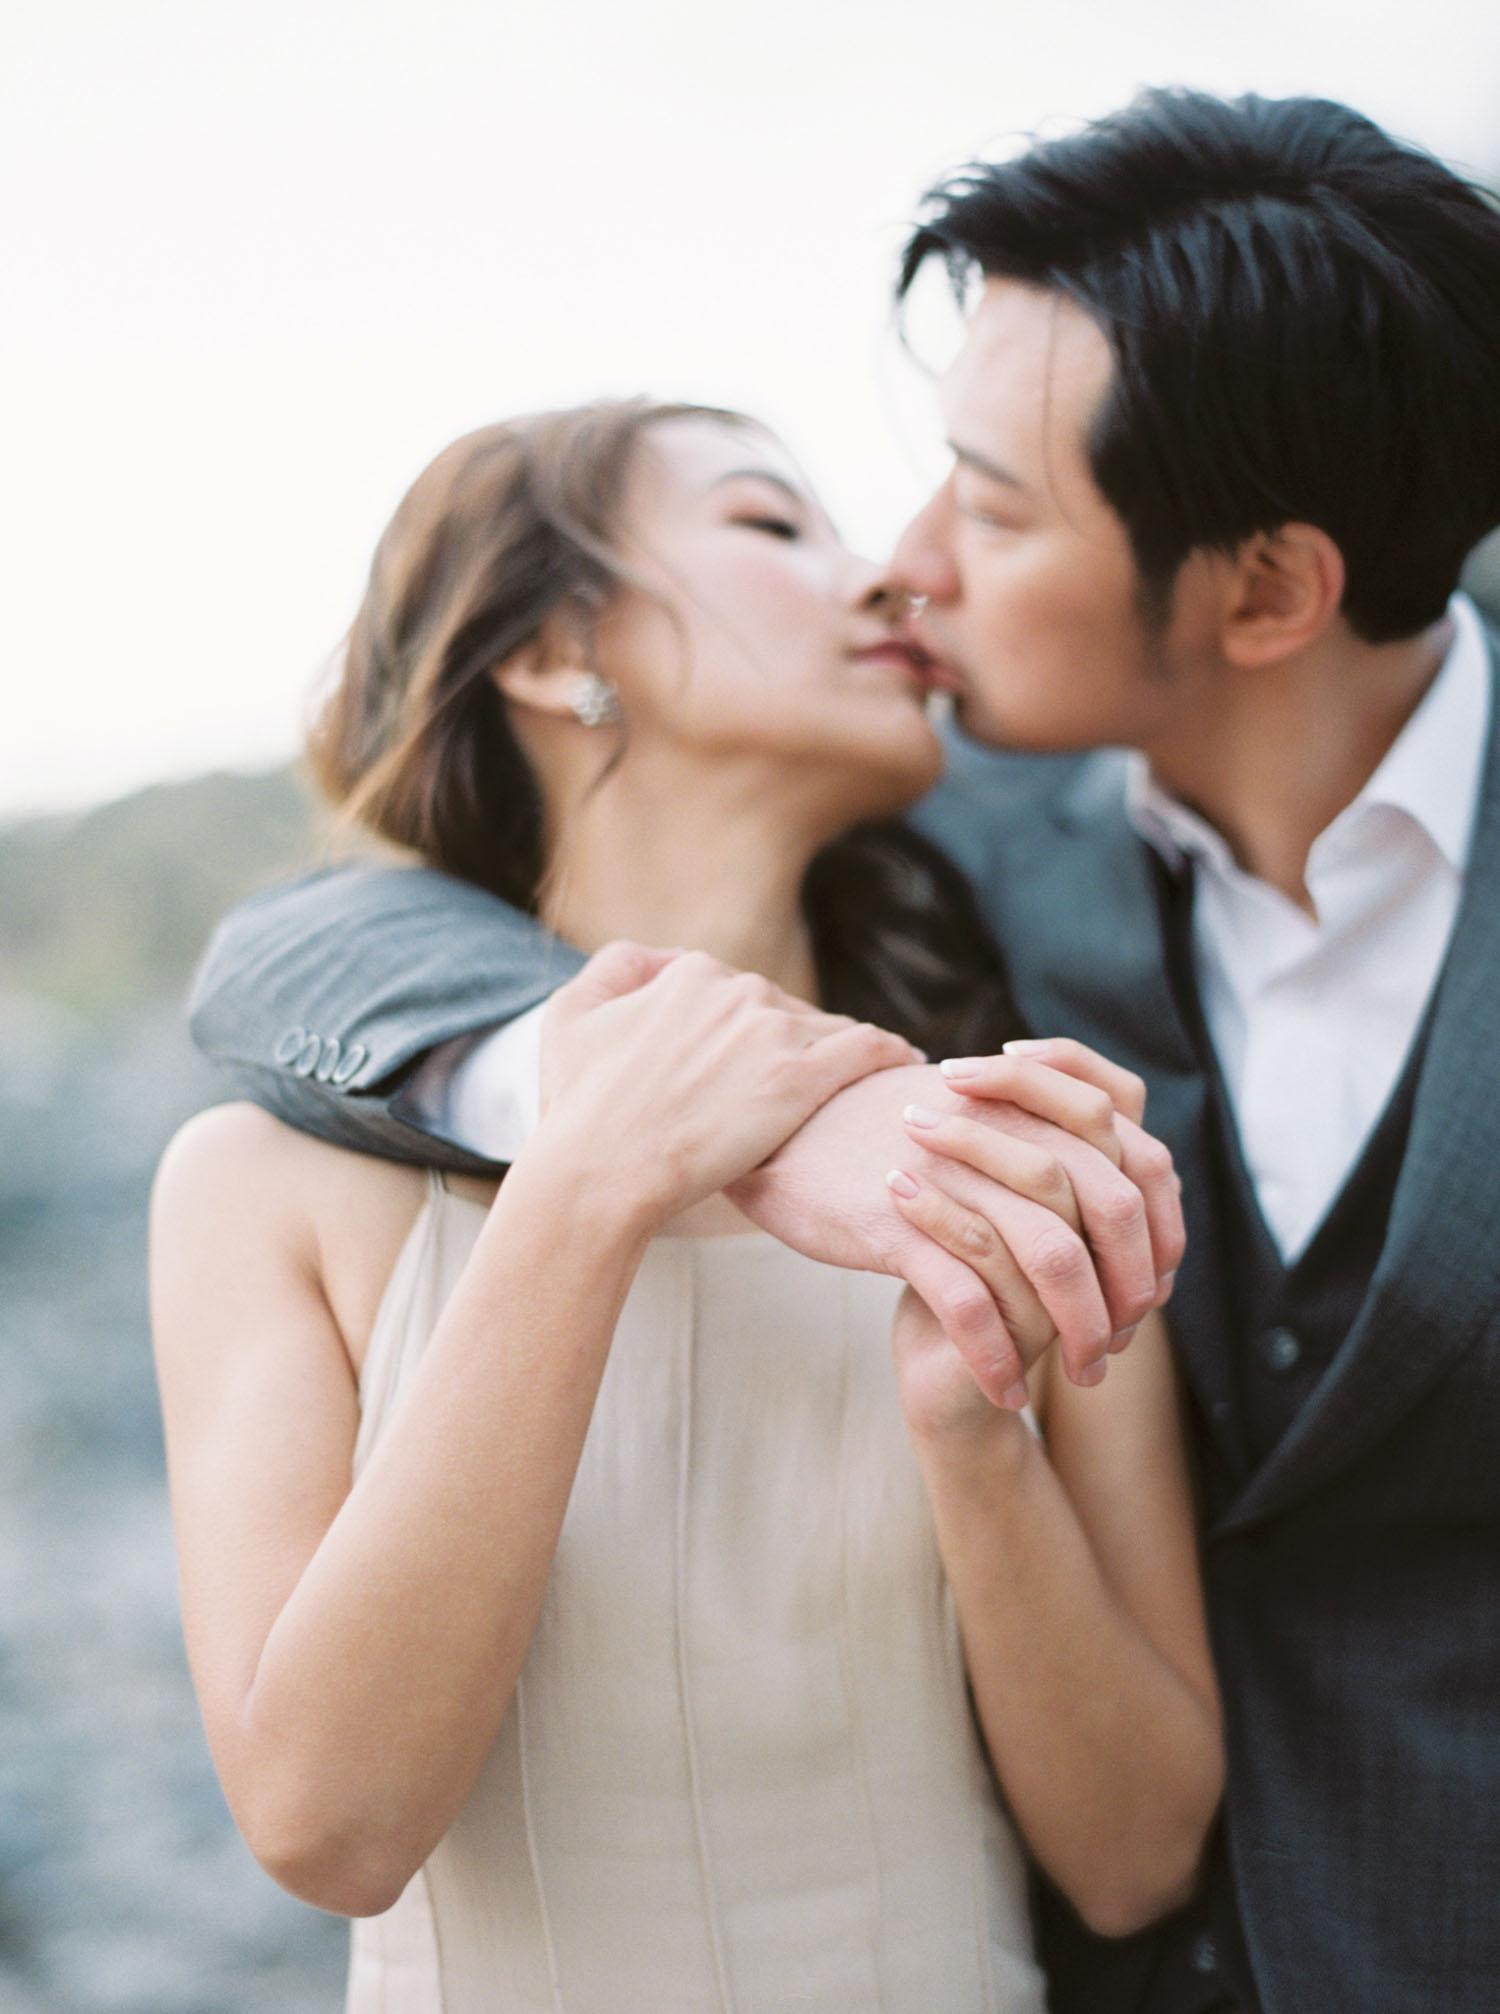 Christy 陳瑋薇 婚紗 唯諾婚紗 老公